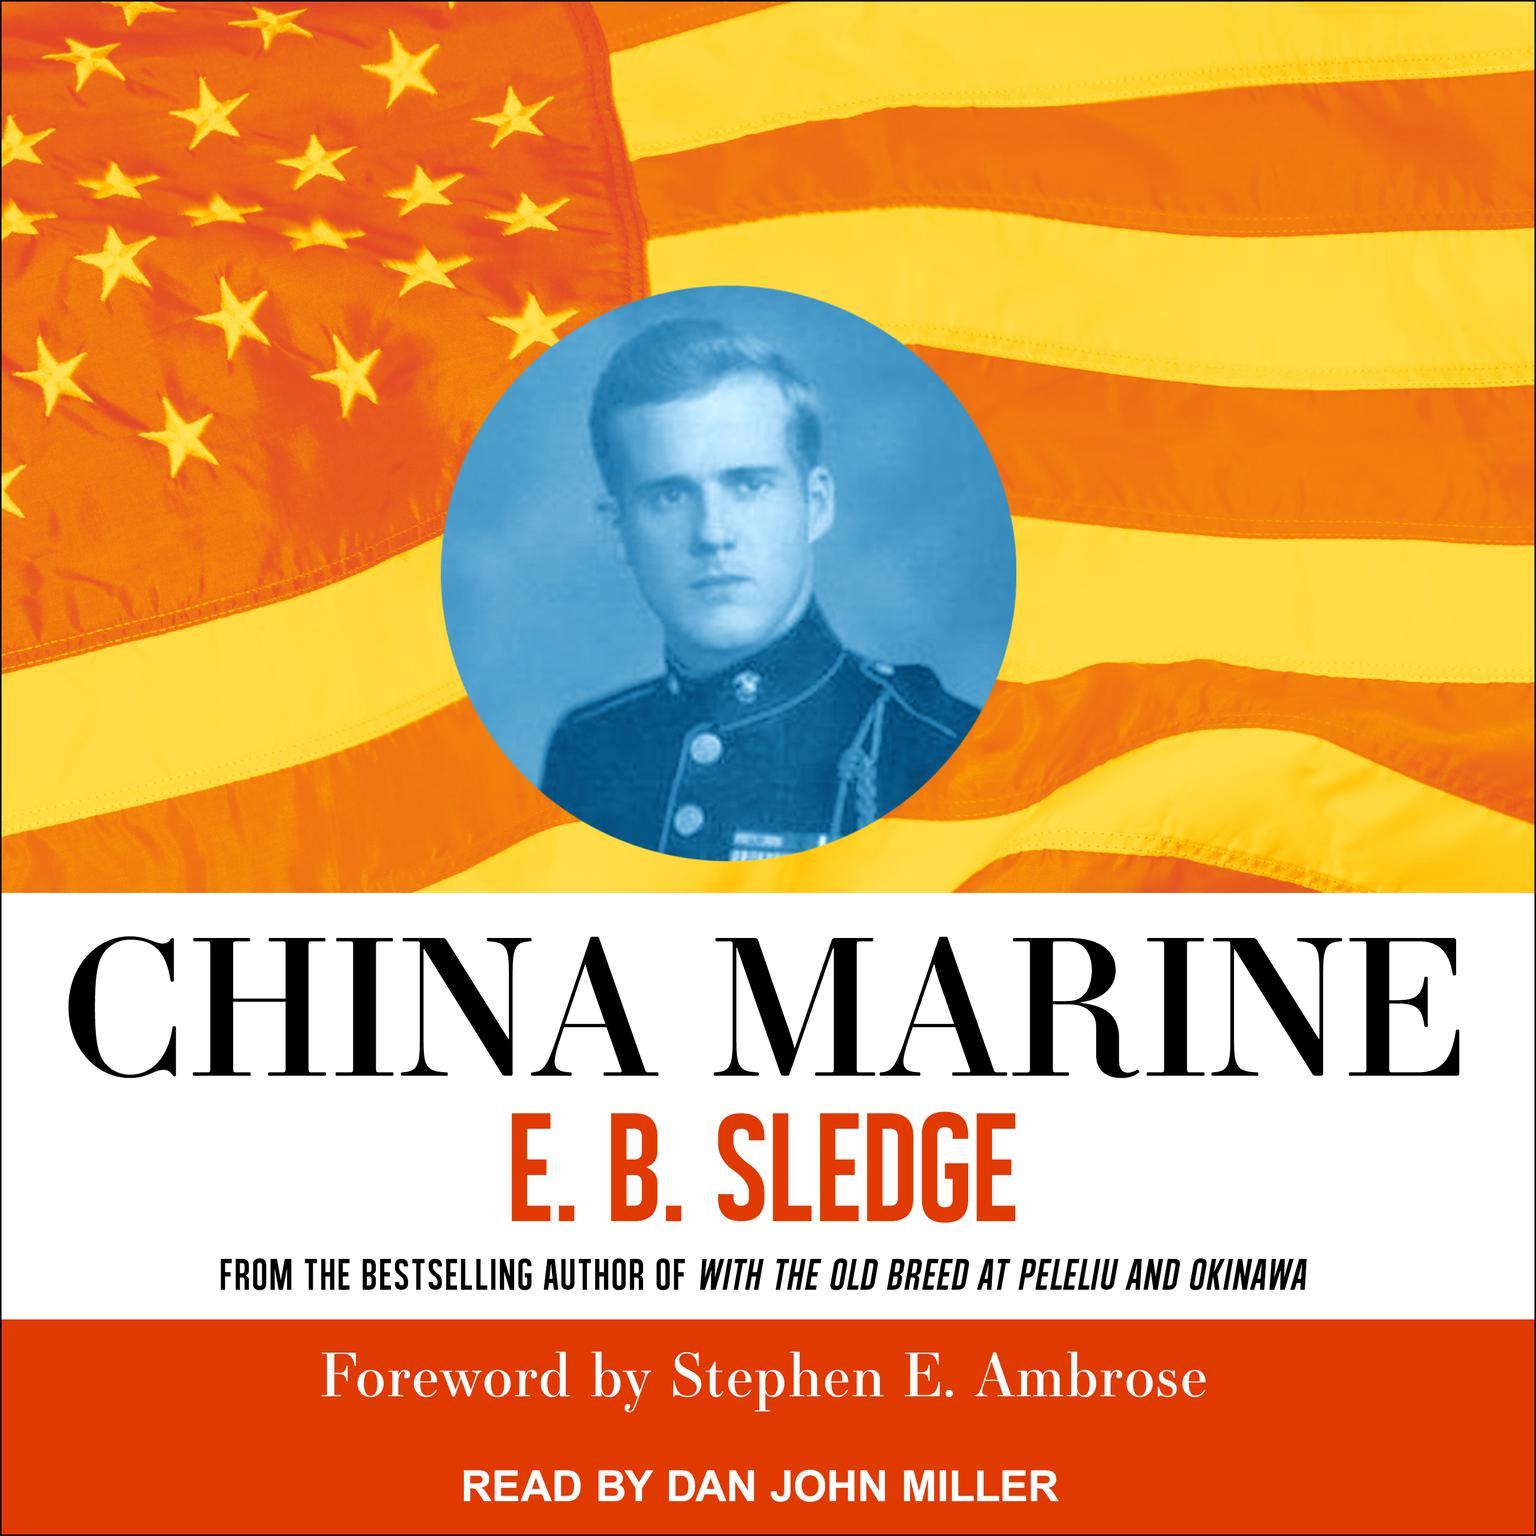 China Marine: An Infantrymans Life After World War II Audiobook, by E.B. Sledge